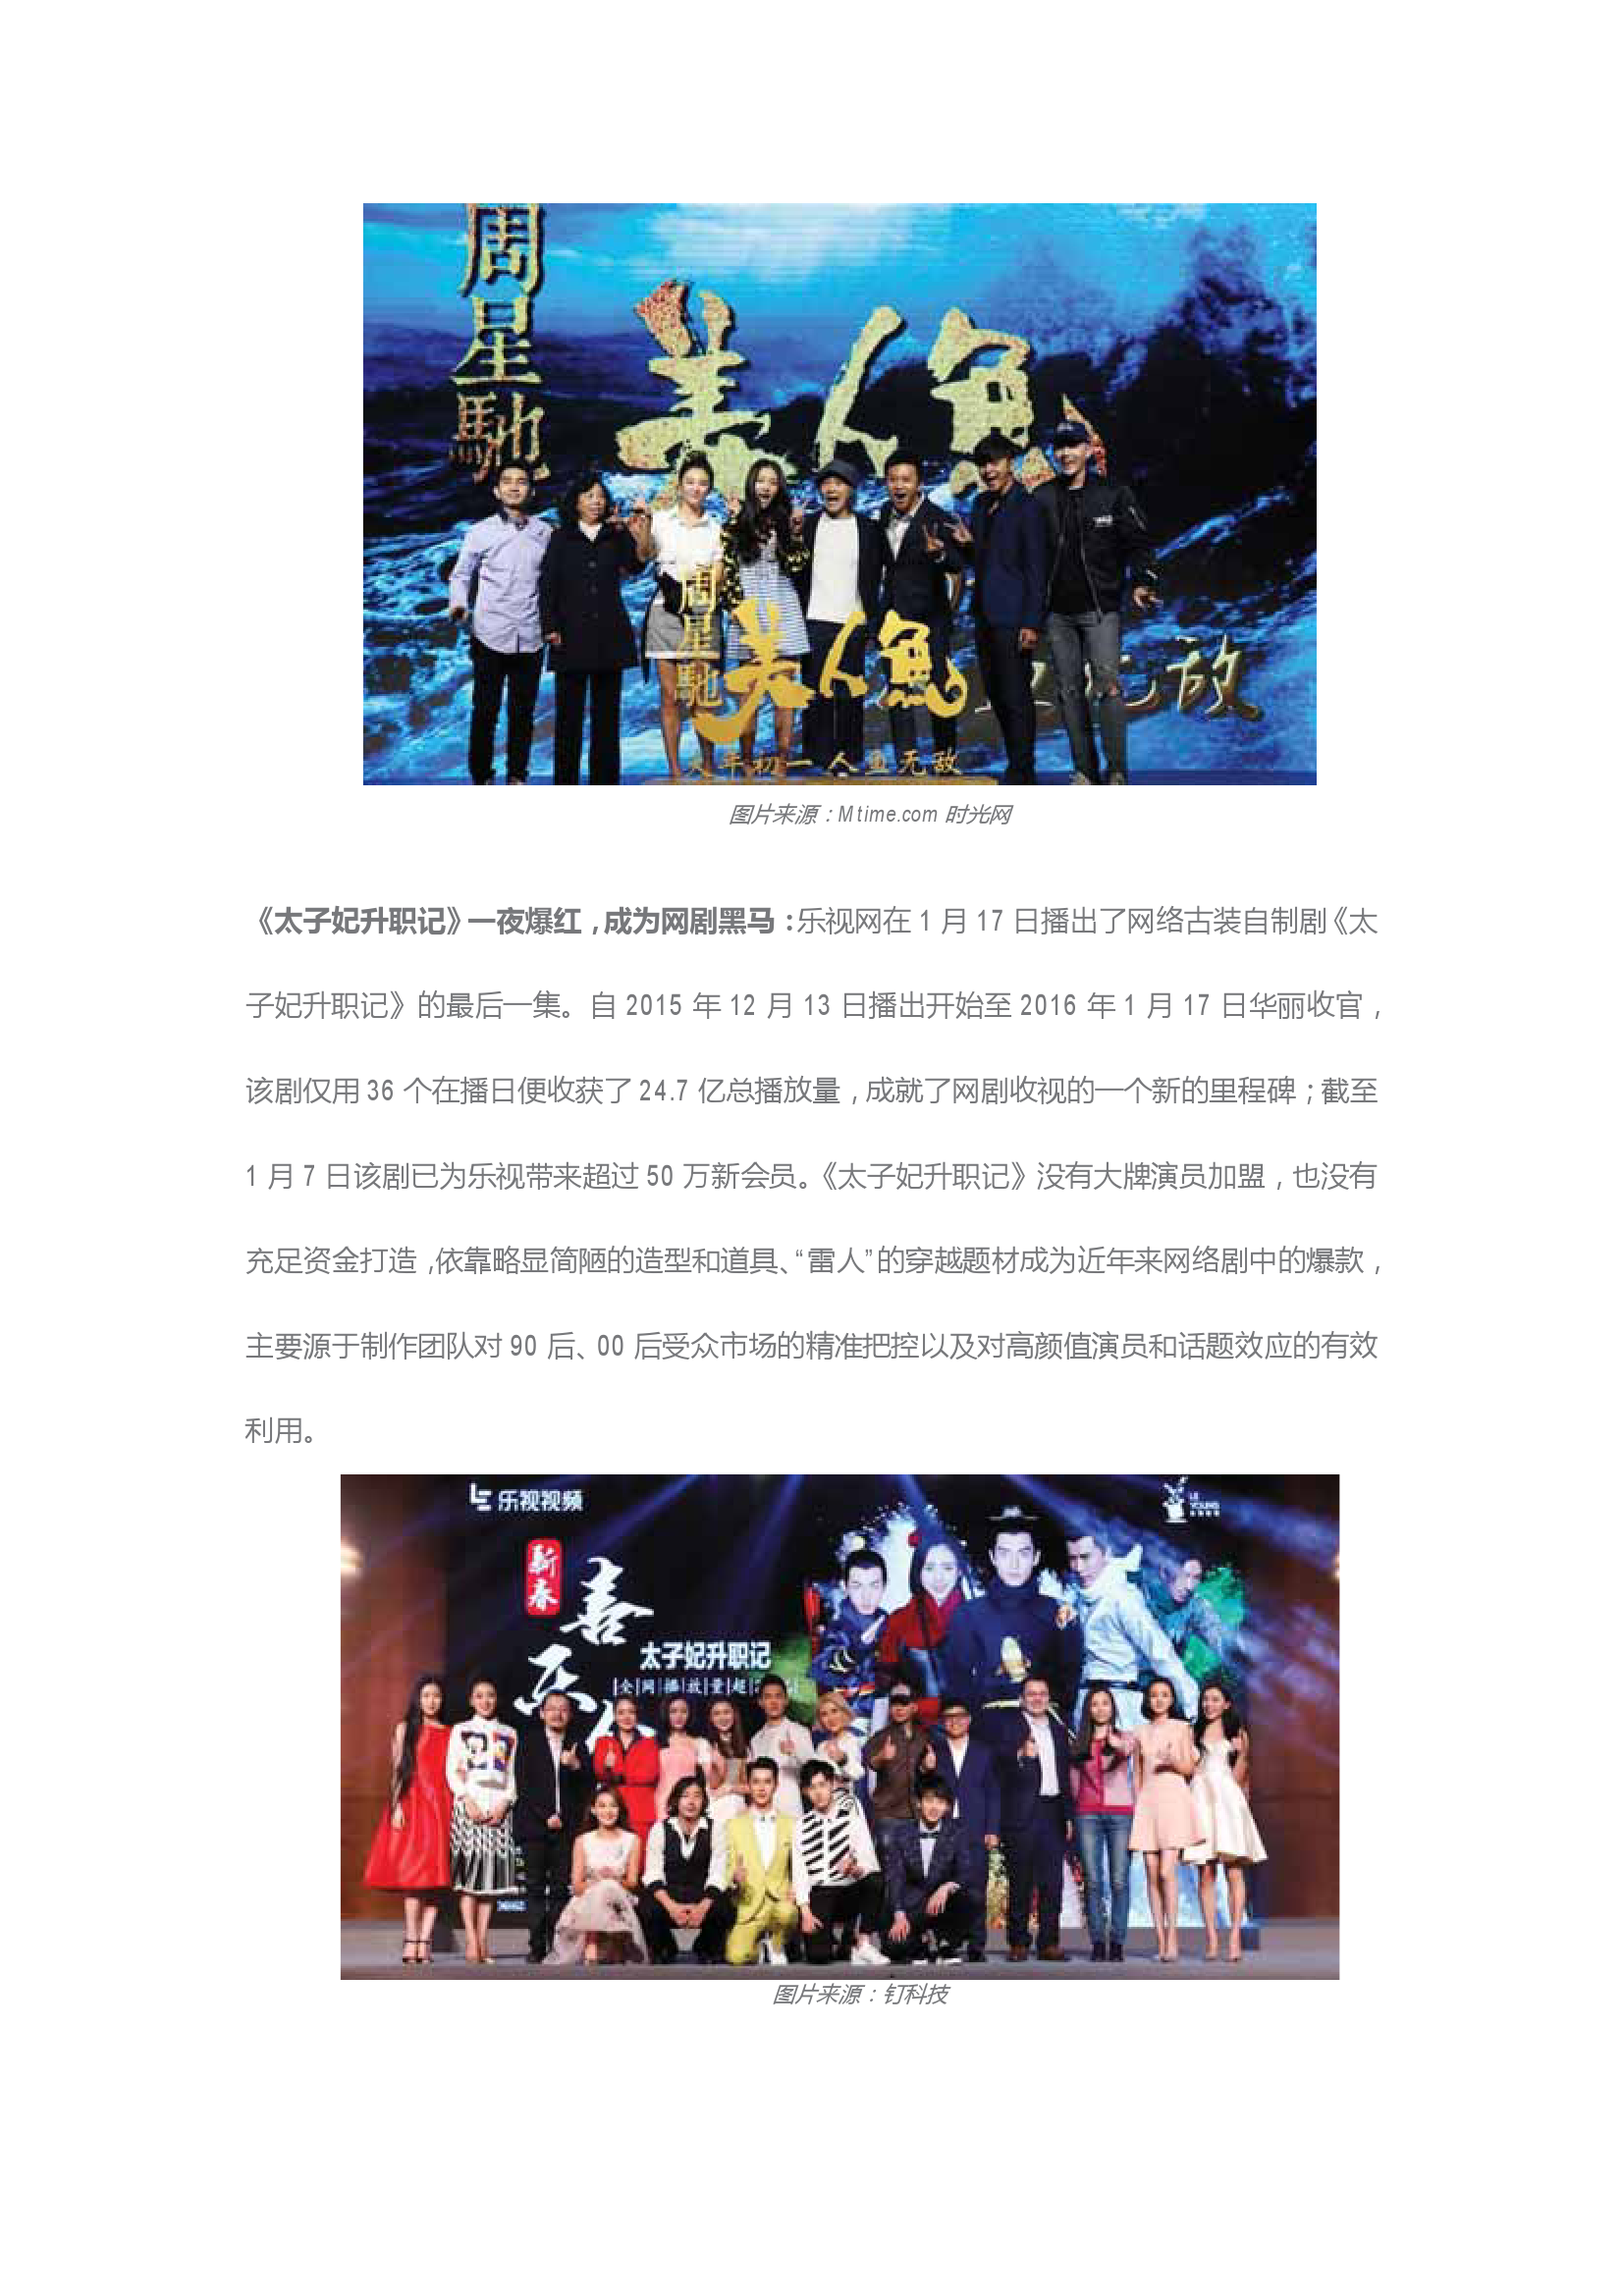 2016Q1中国娱乐产业季度观察_000007